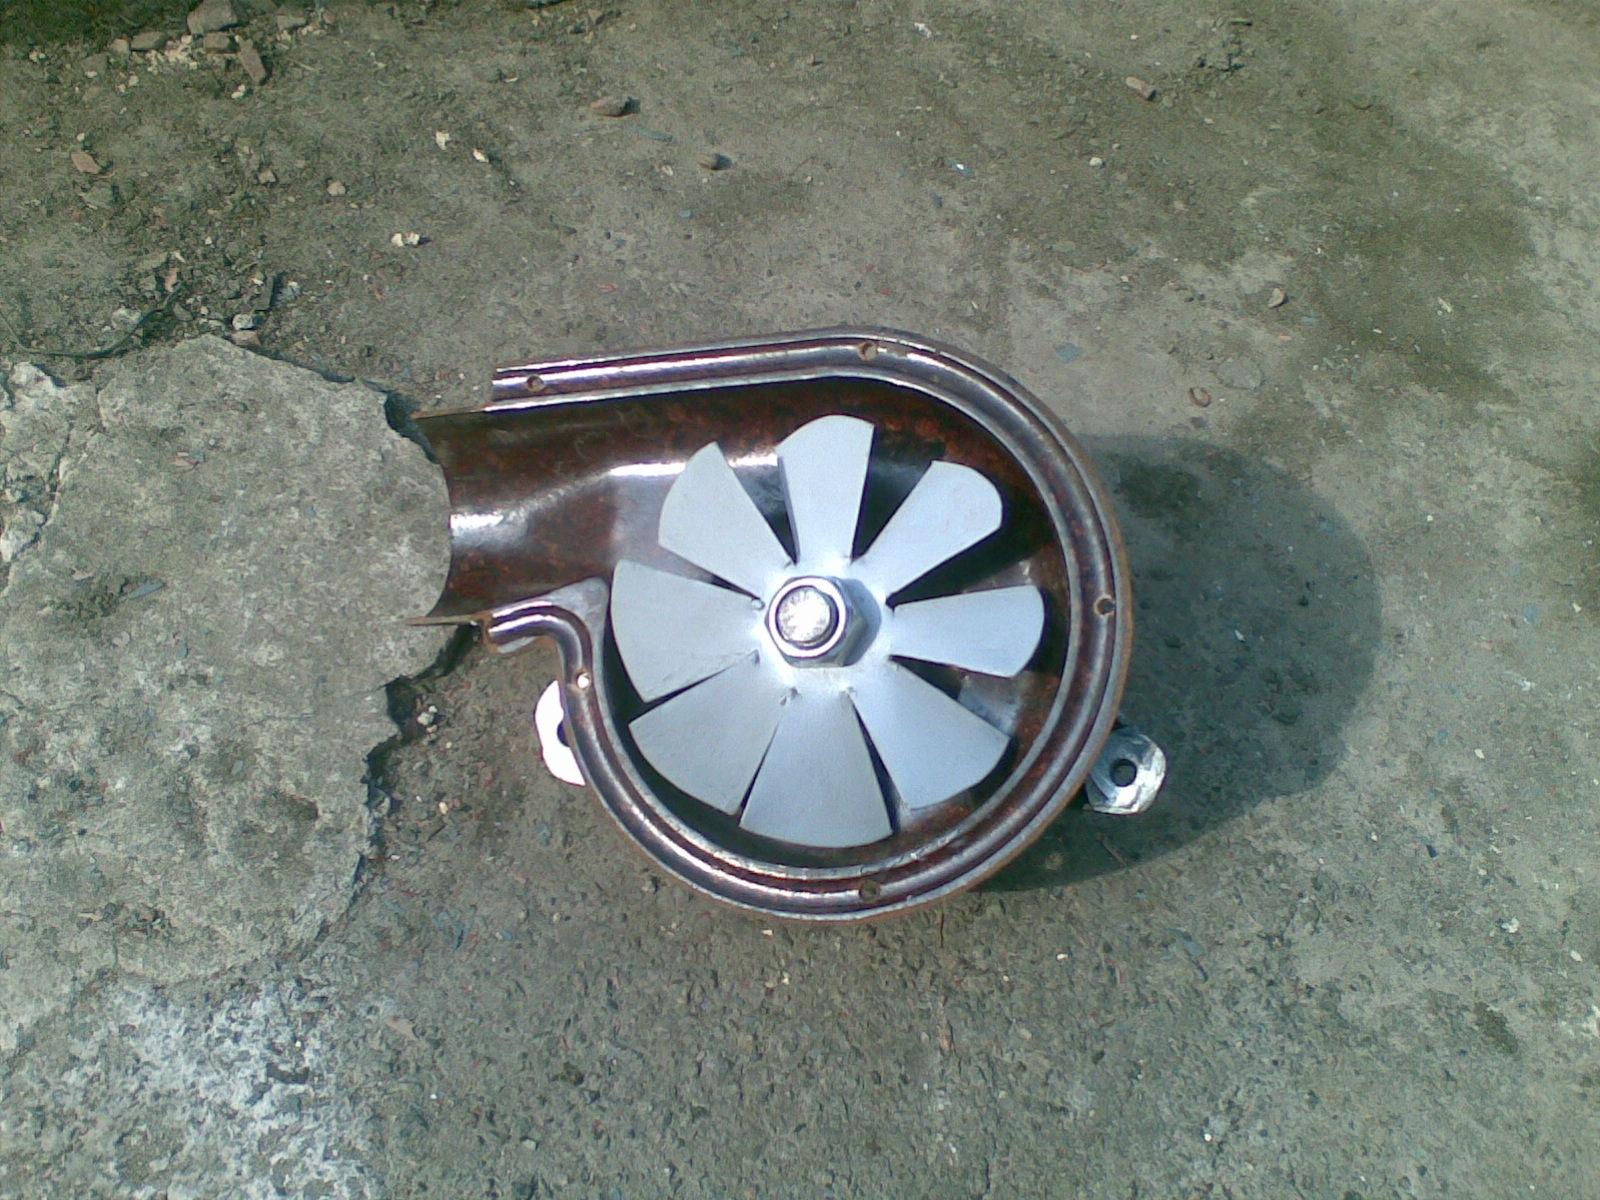 Турбина из кулера своими руками